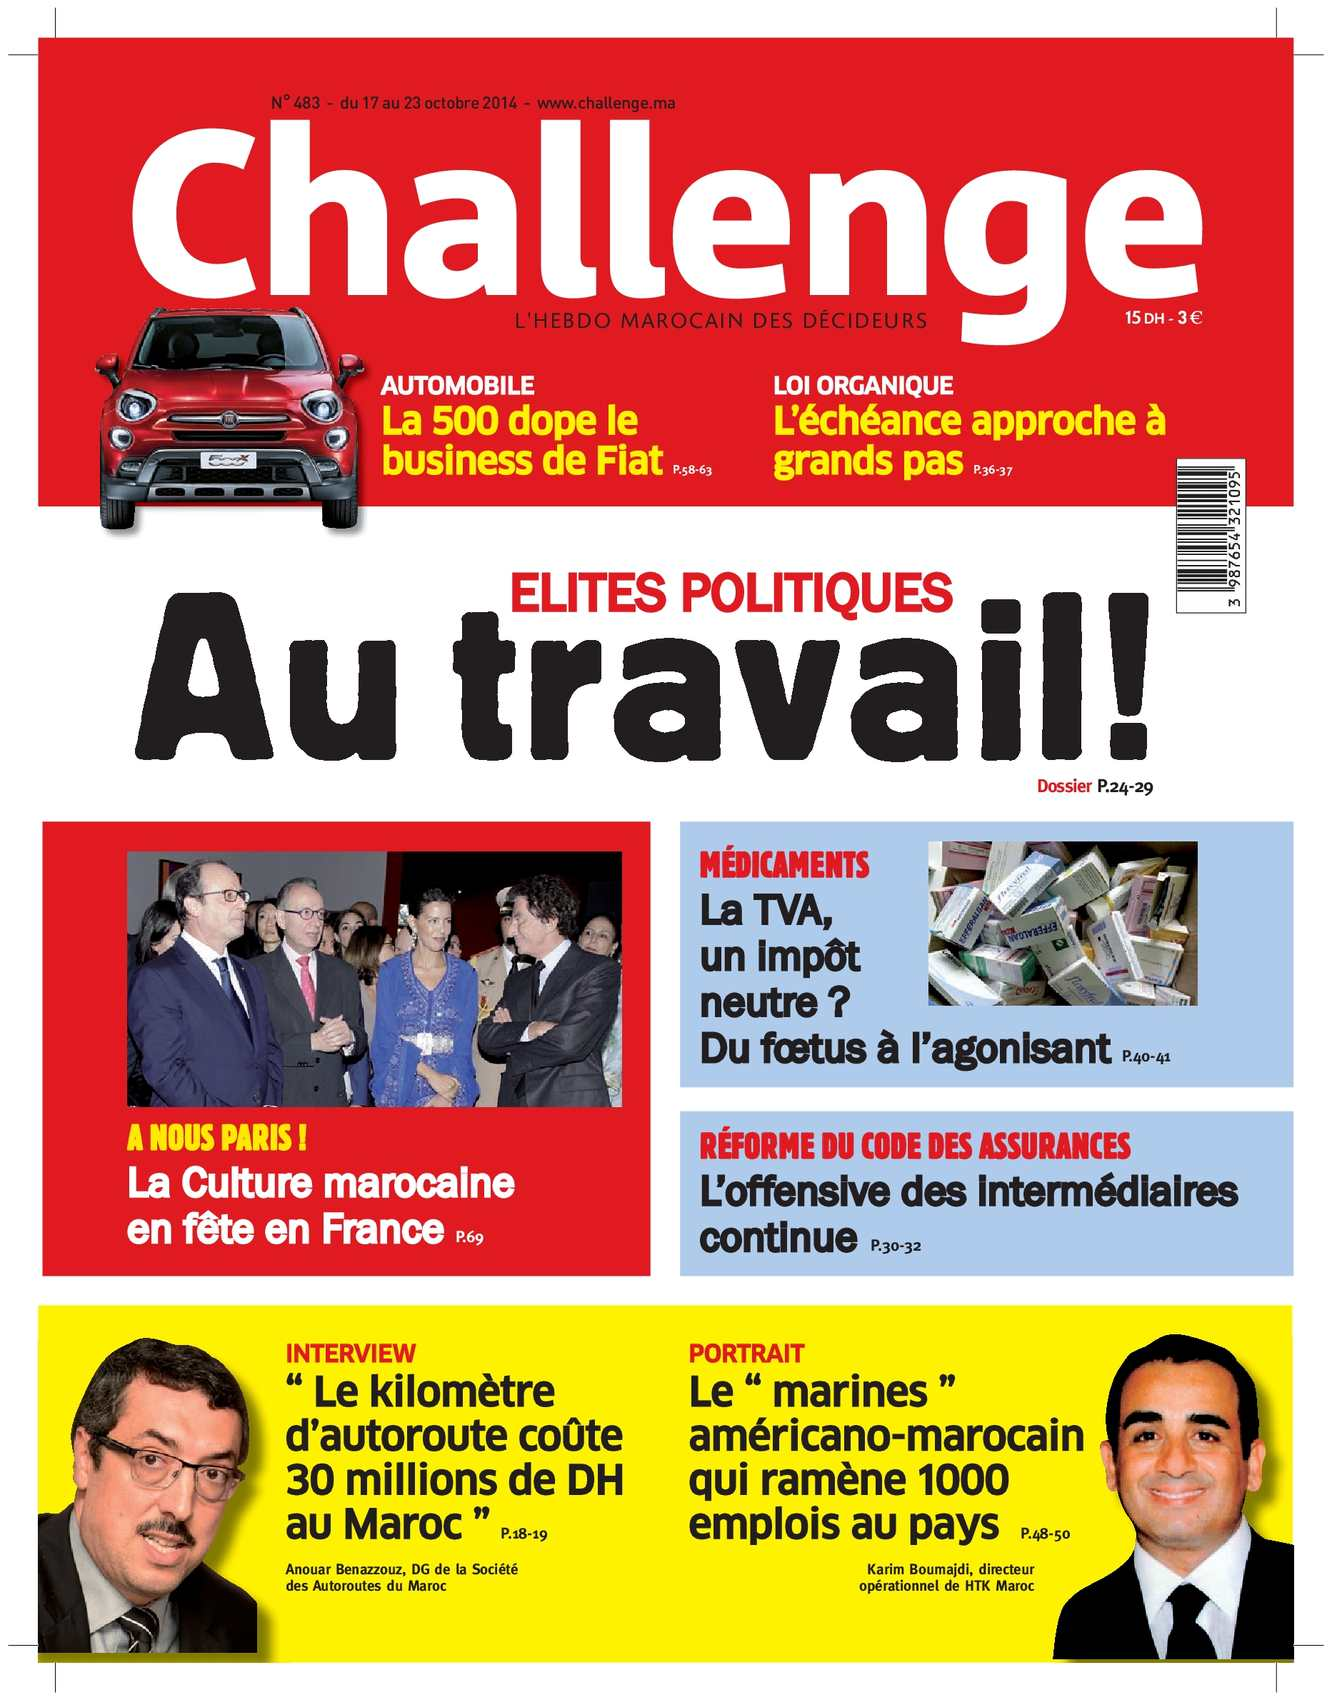 Calaméo Challenge 483